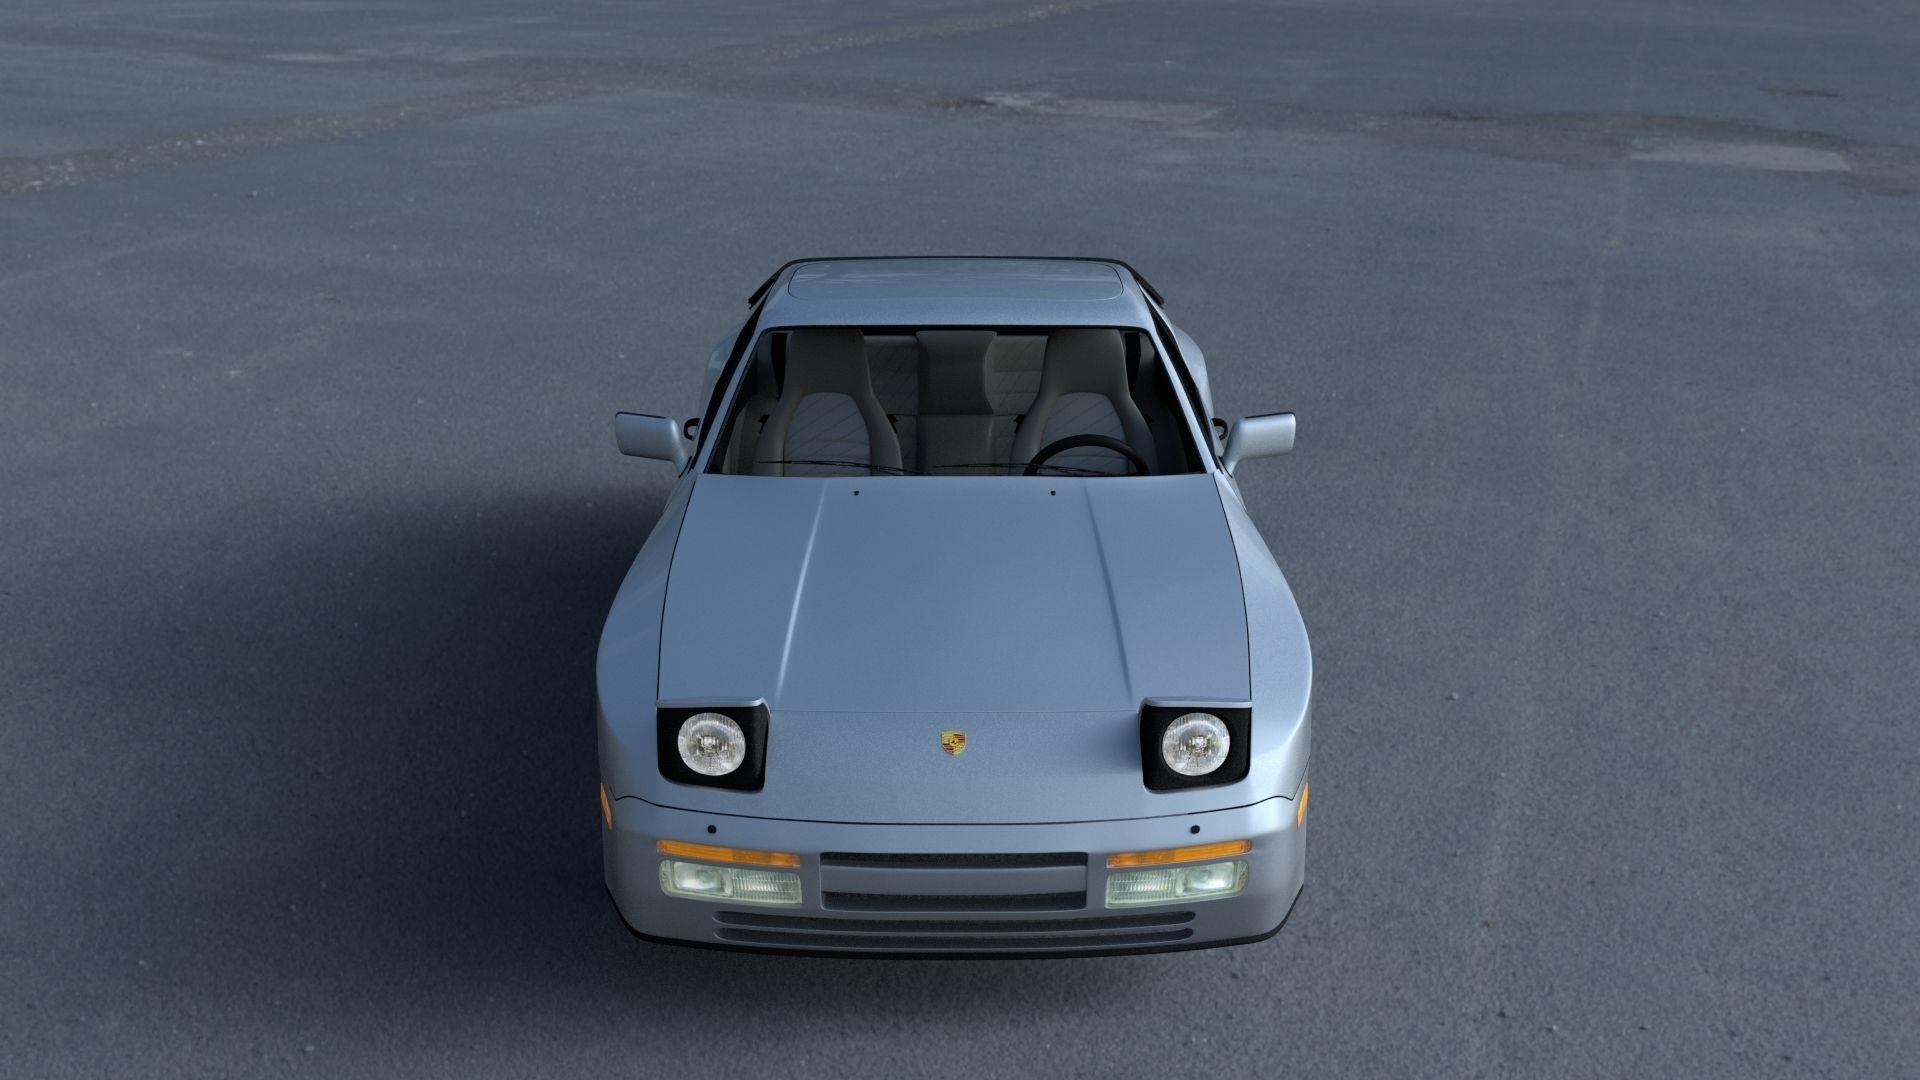 Porsche 944 s2 with interior hdri 3d model obj fbx stl for Porsche 944 interieur